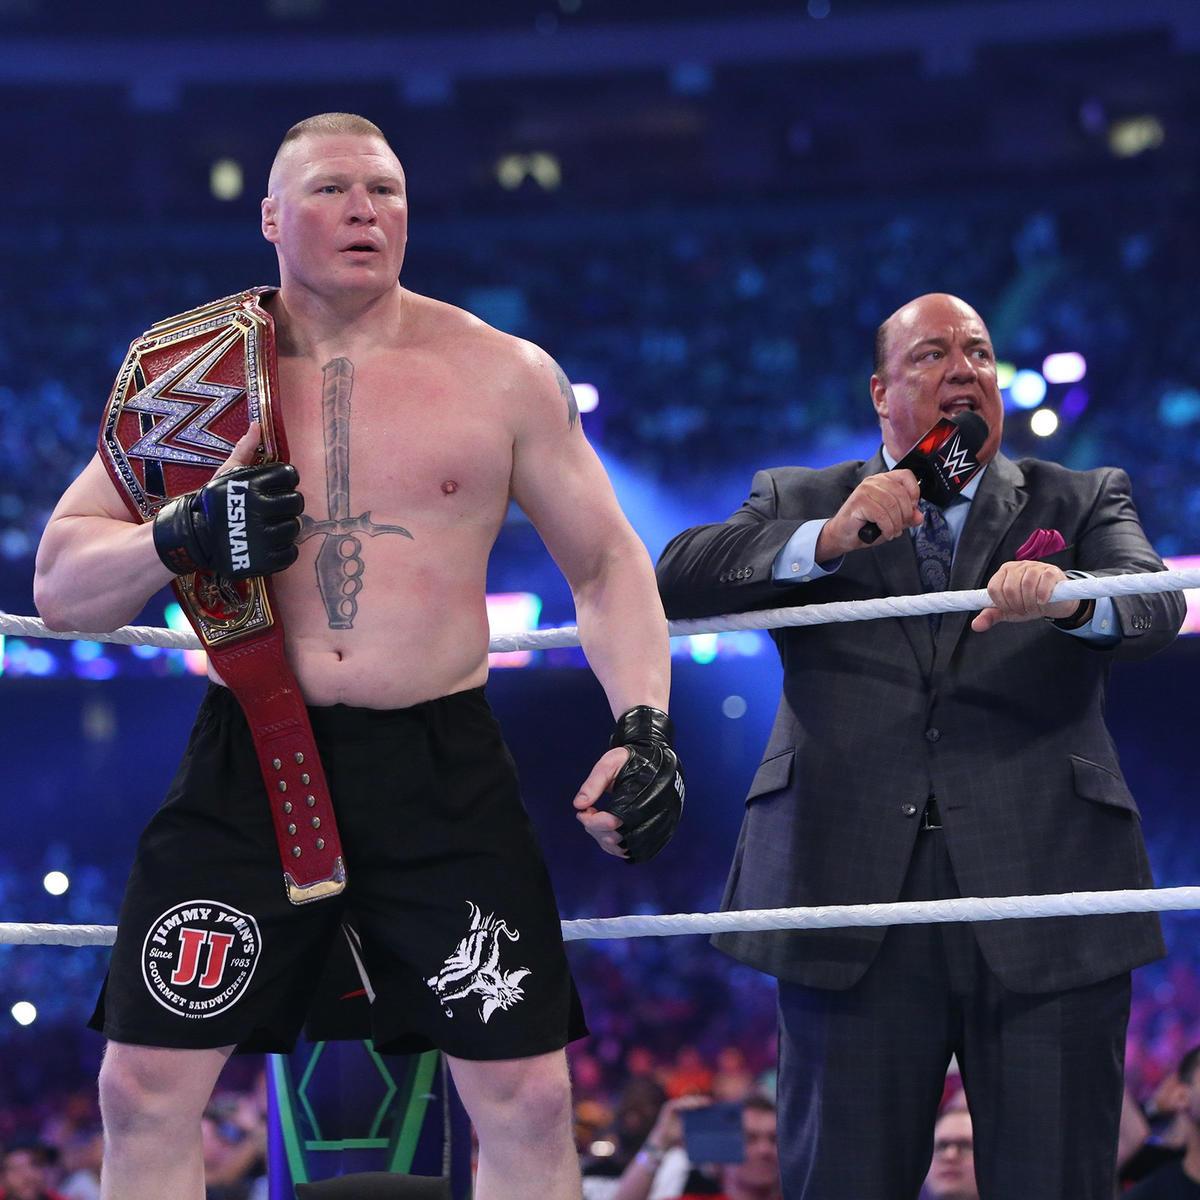 Brock Lesnar Vs Roman Reigns Universal Championship Match